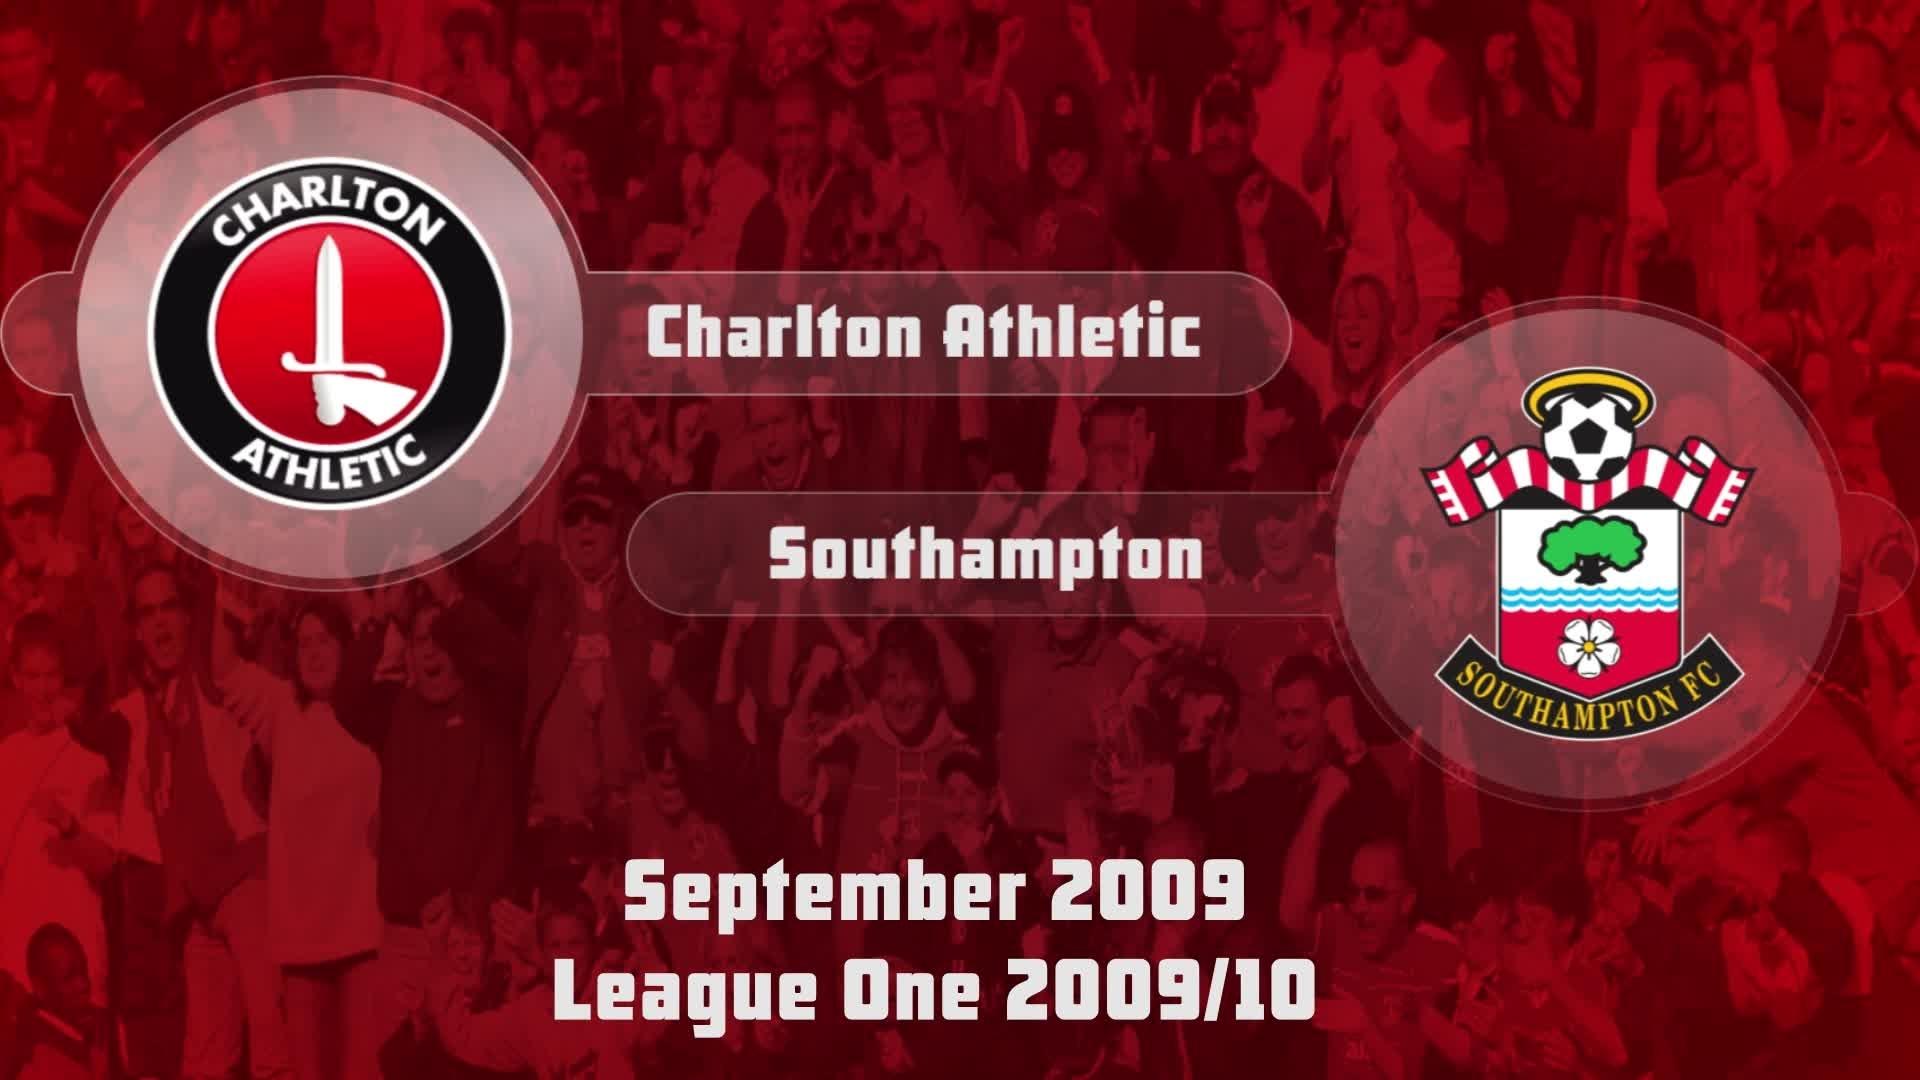 08 HIGHLIGHTS | Charlton 1 Southampton 1 (Sept 2009)